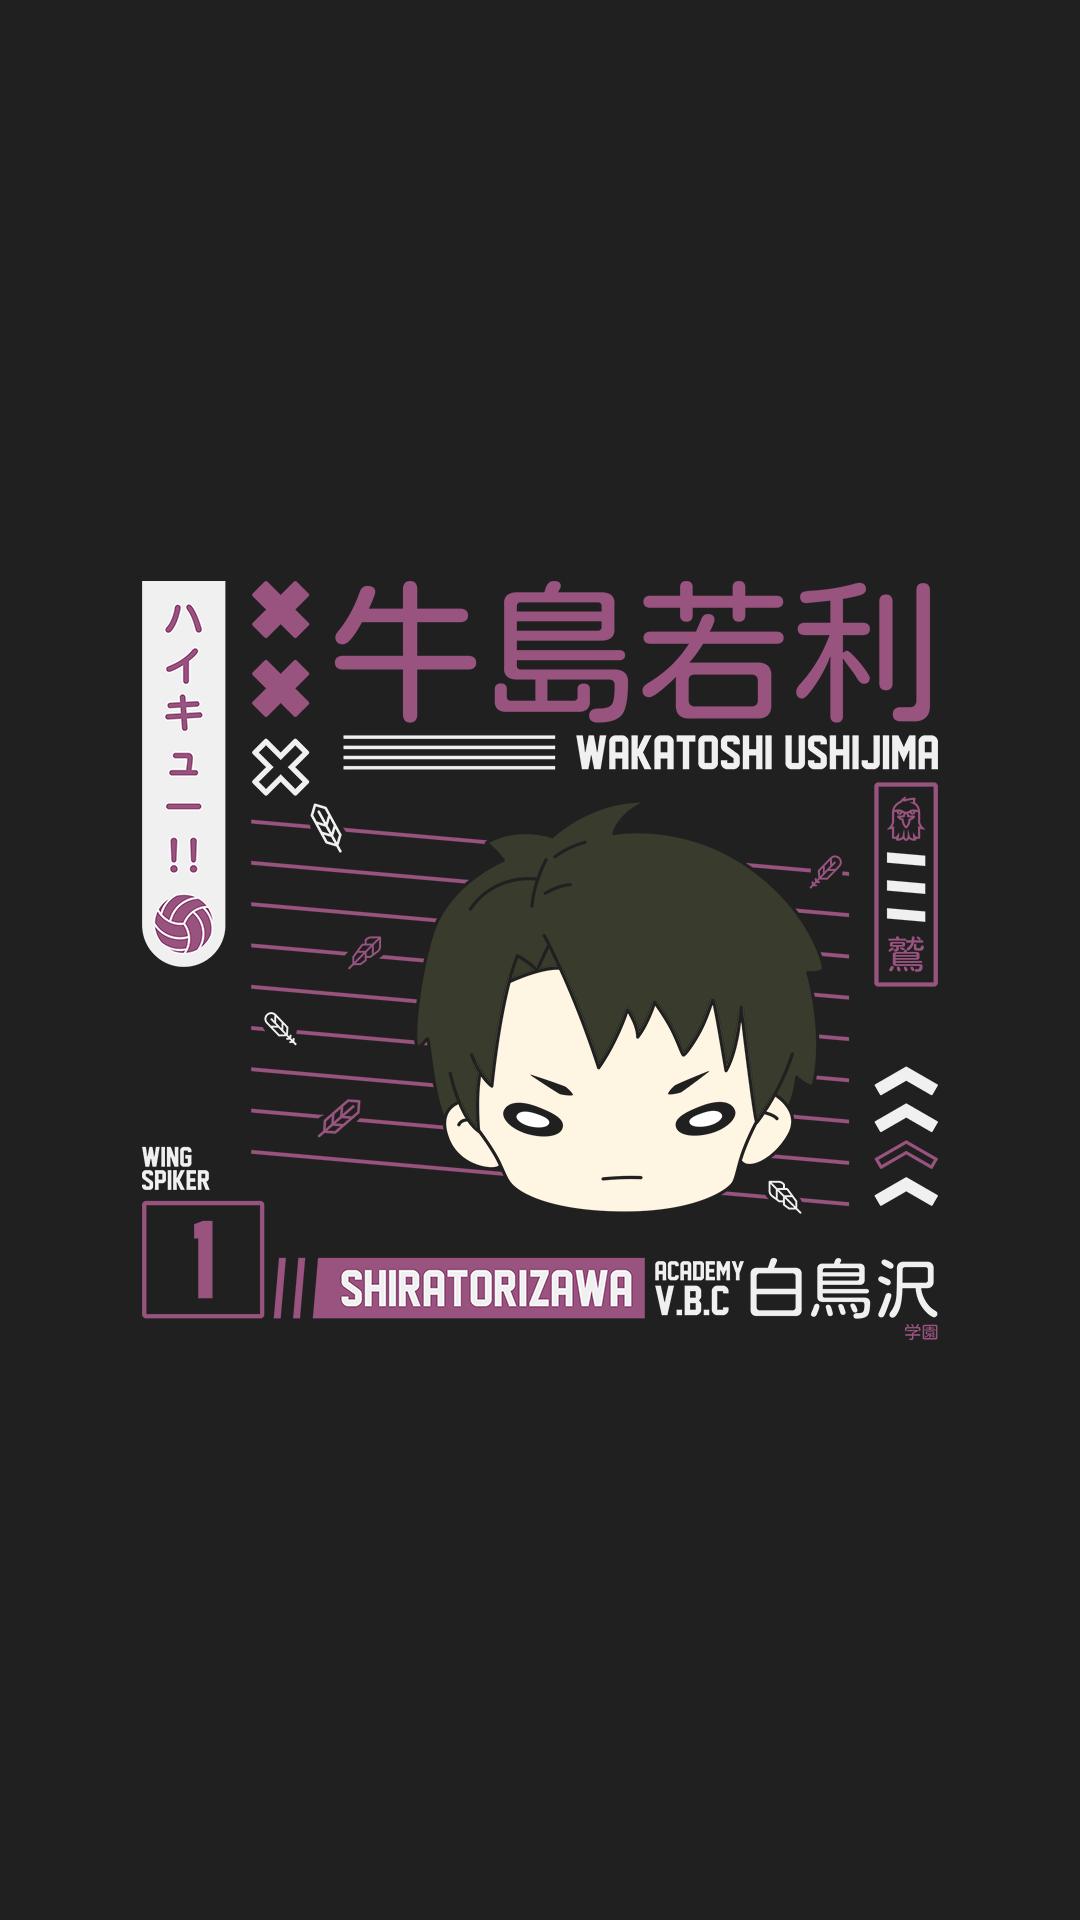 Wakatoshi Ushijima Wallpaper Shiratorizawa Haikyuu Ushijima Wakatoshi Haikyuu Ushijima Haikyuu Wallpaper